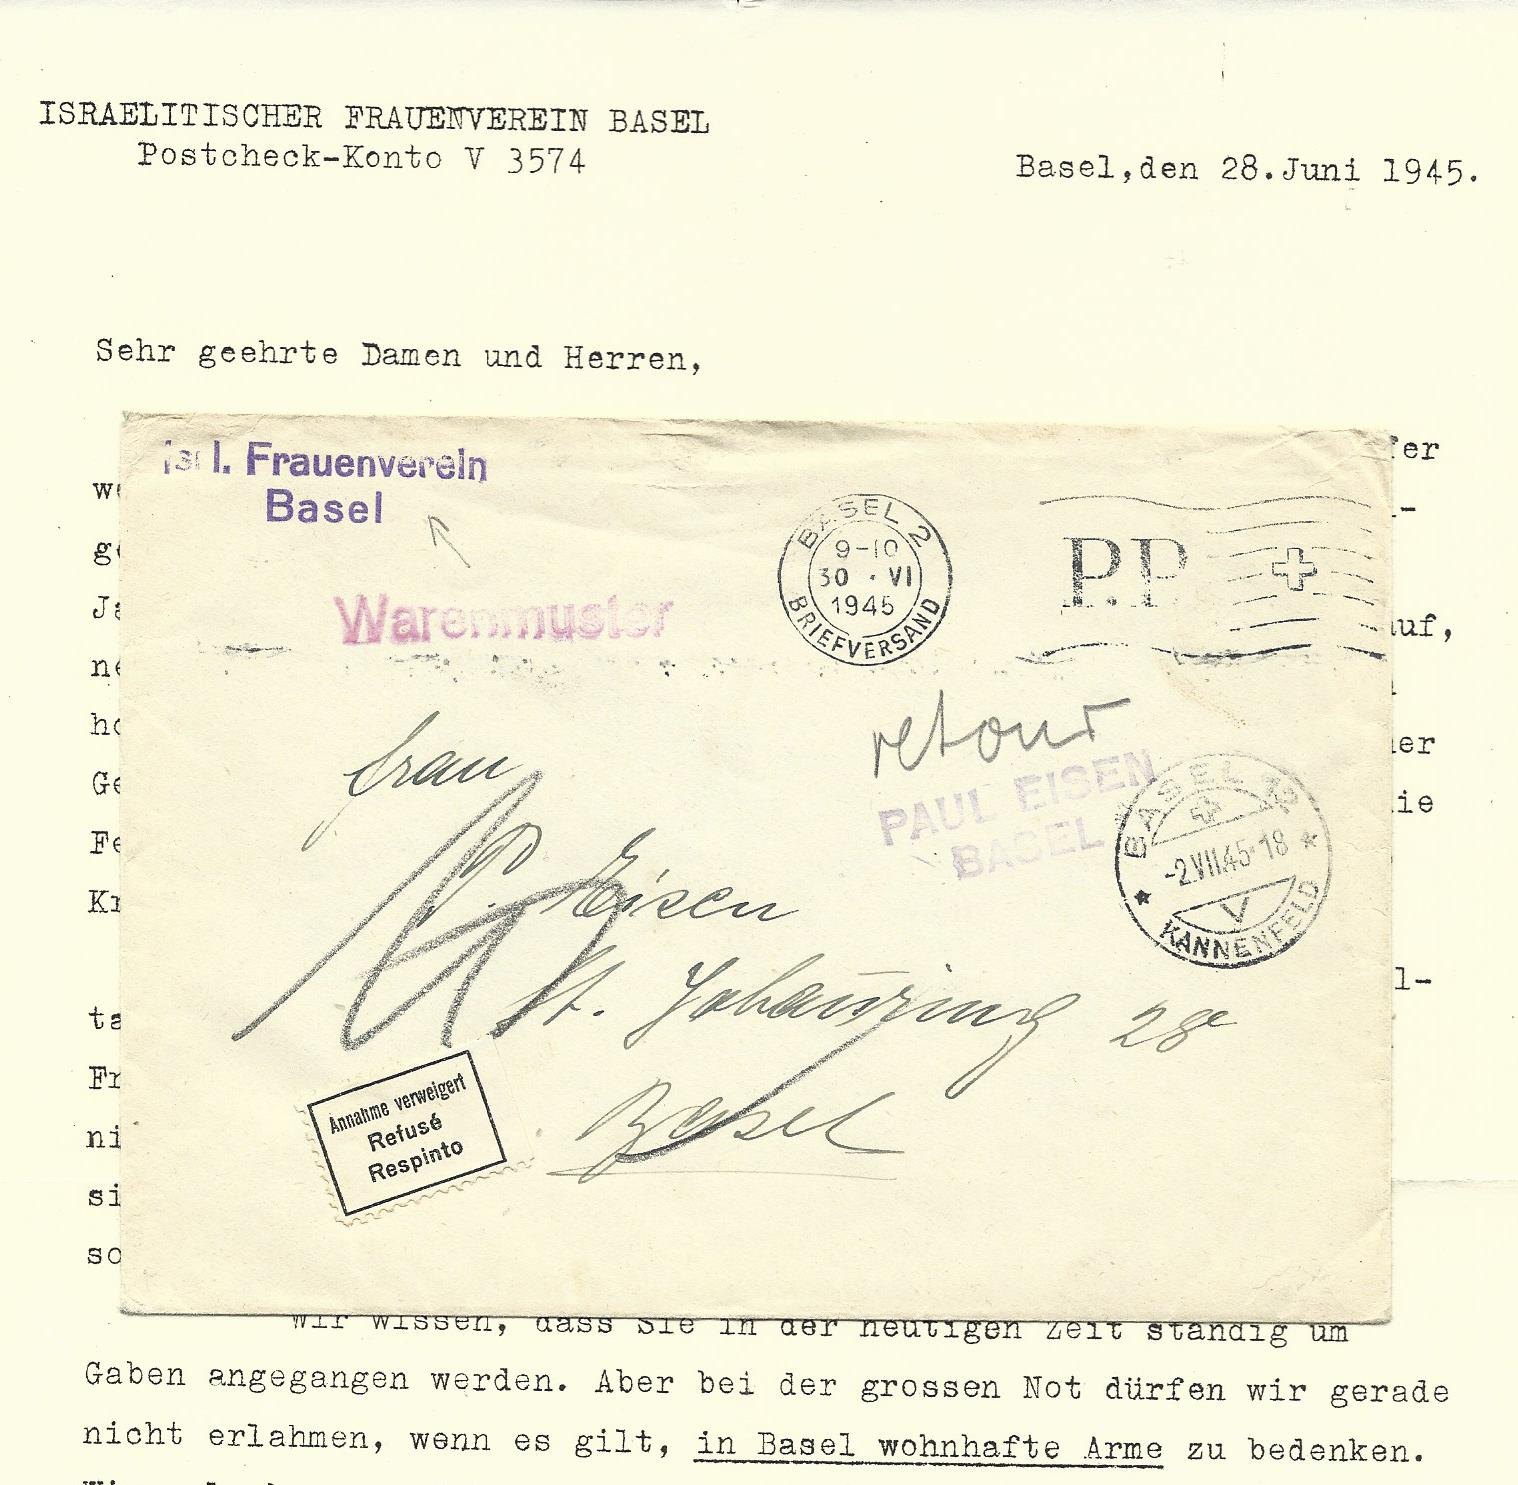 Schweiz Juni 1945, Retour Brief d. Israel Frauenvereins Basel ...